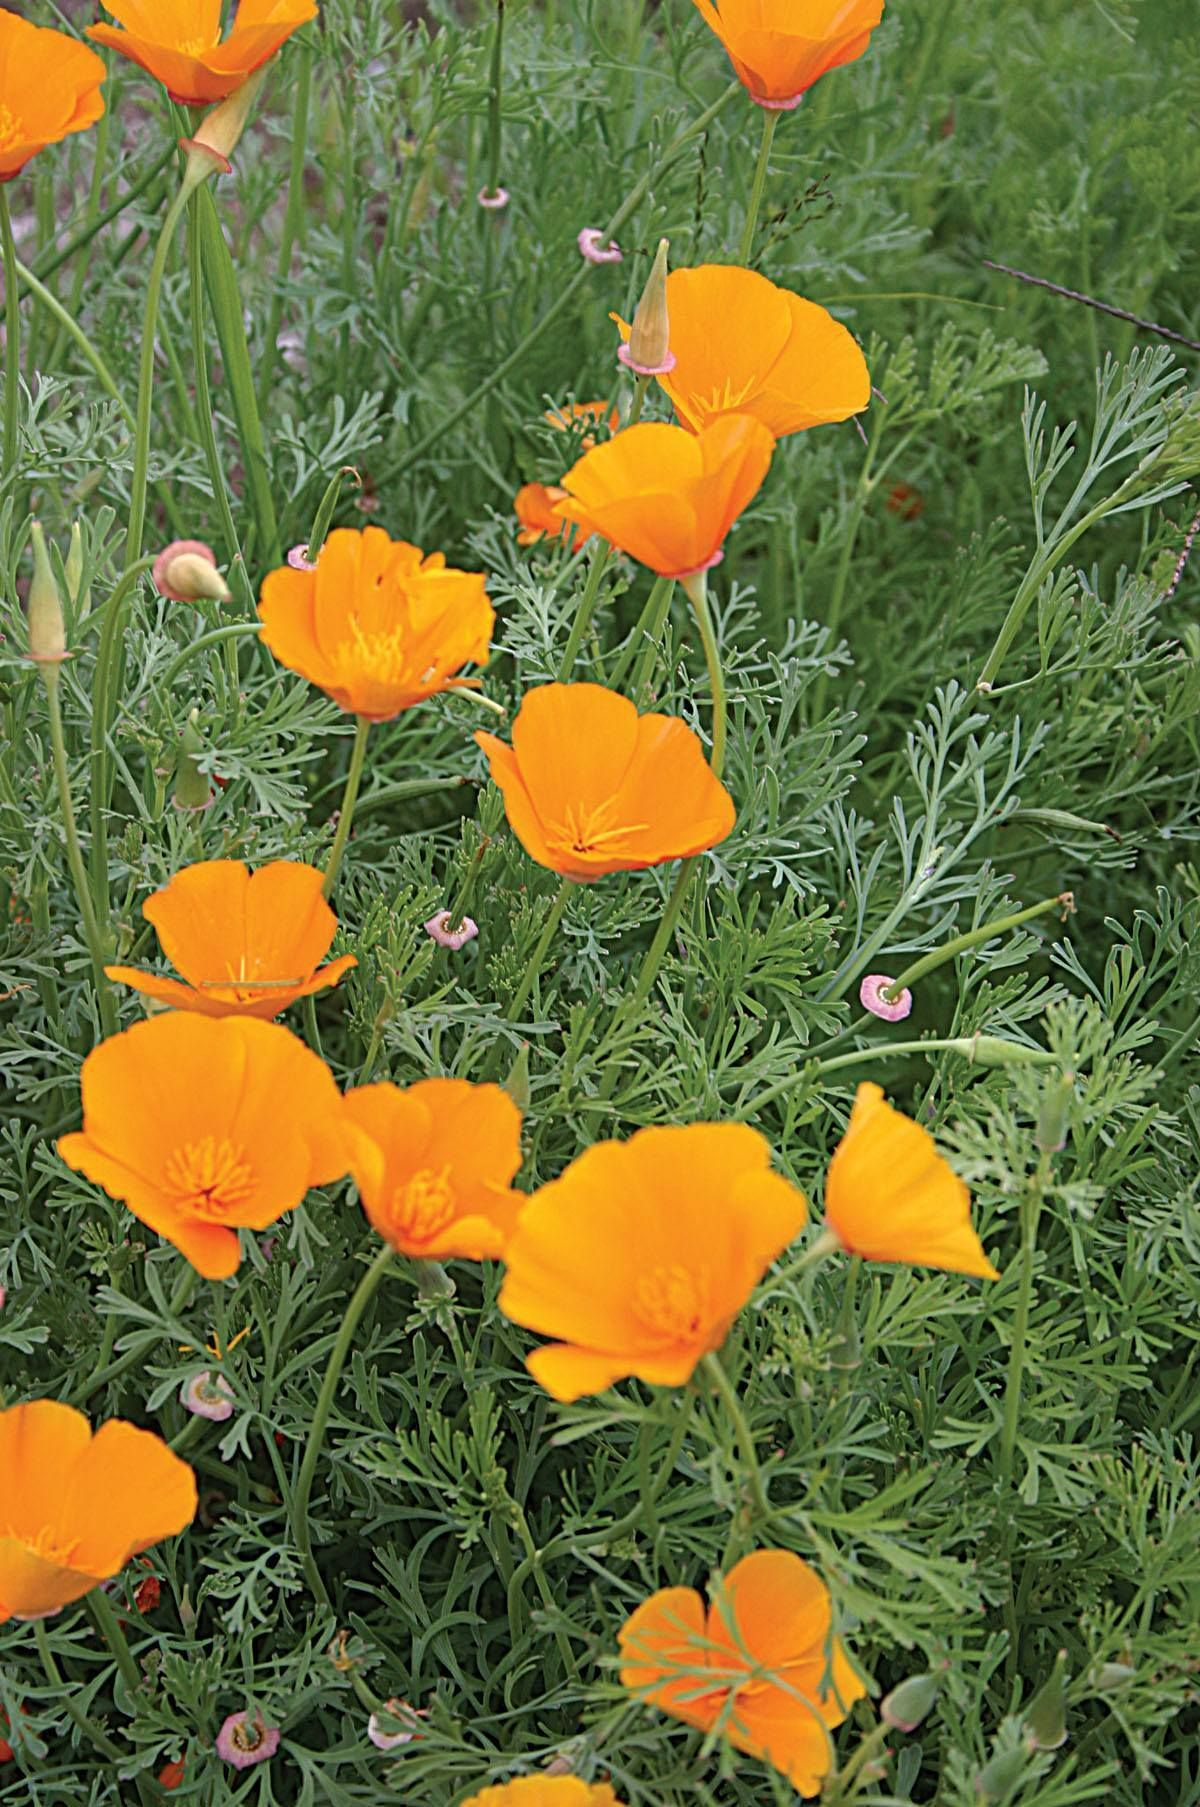 Poppy California Poppies California Poppy Orange Flowers